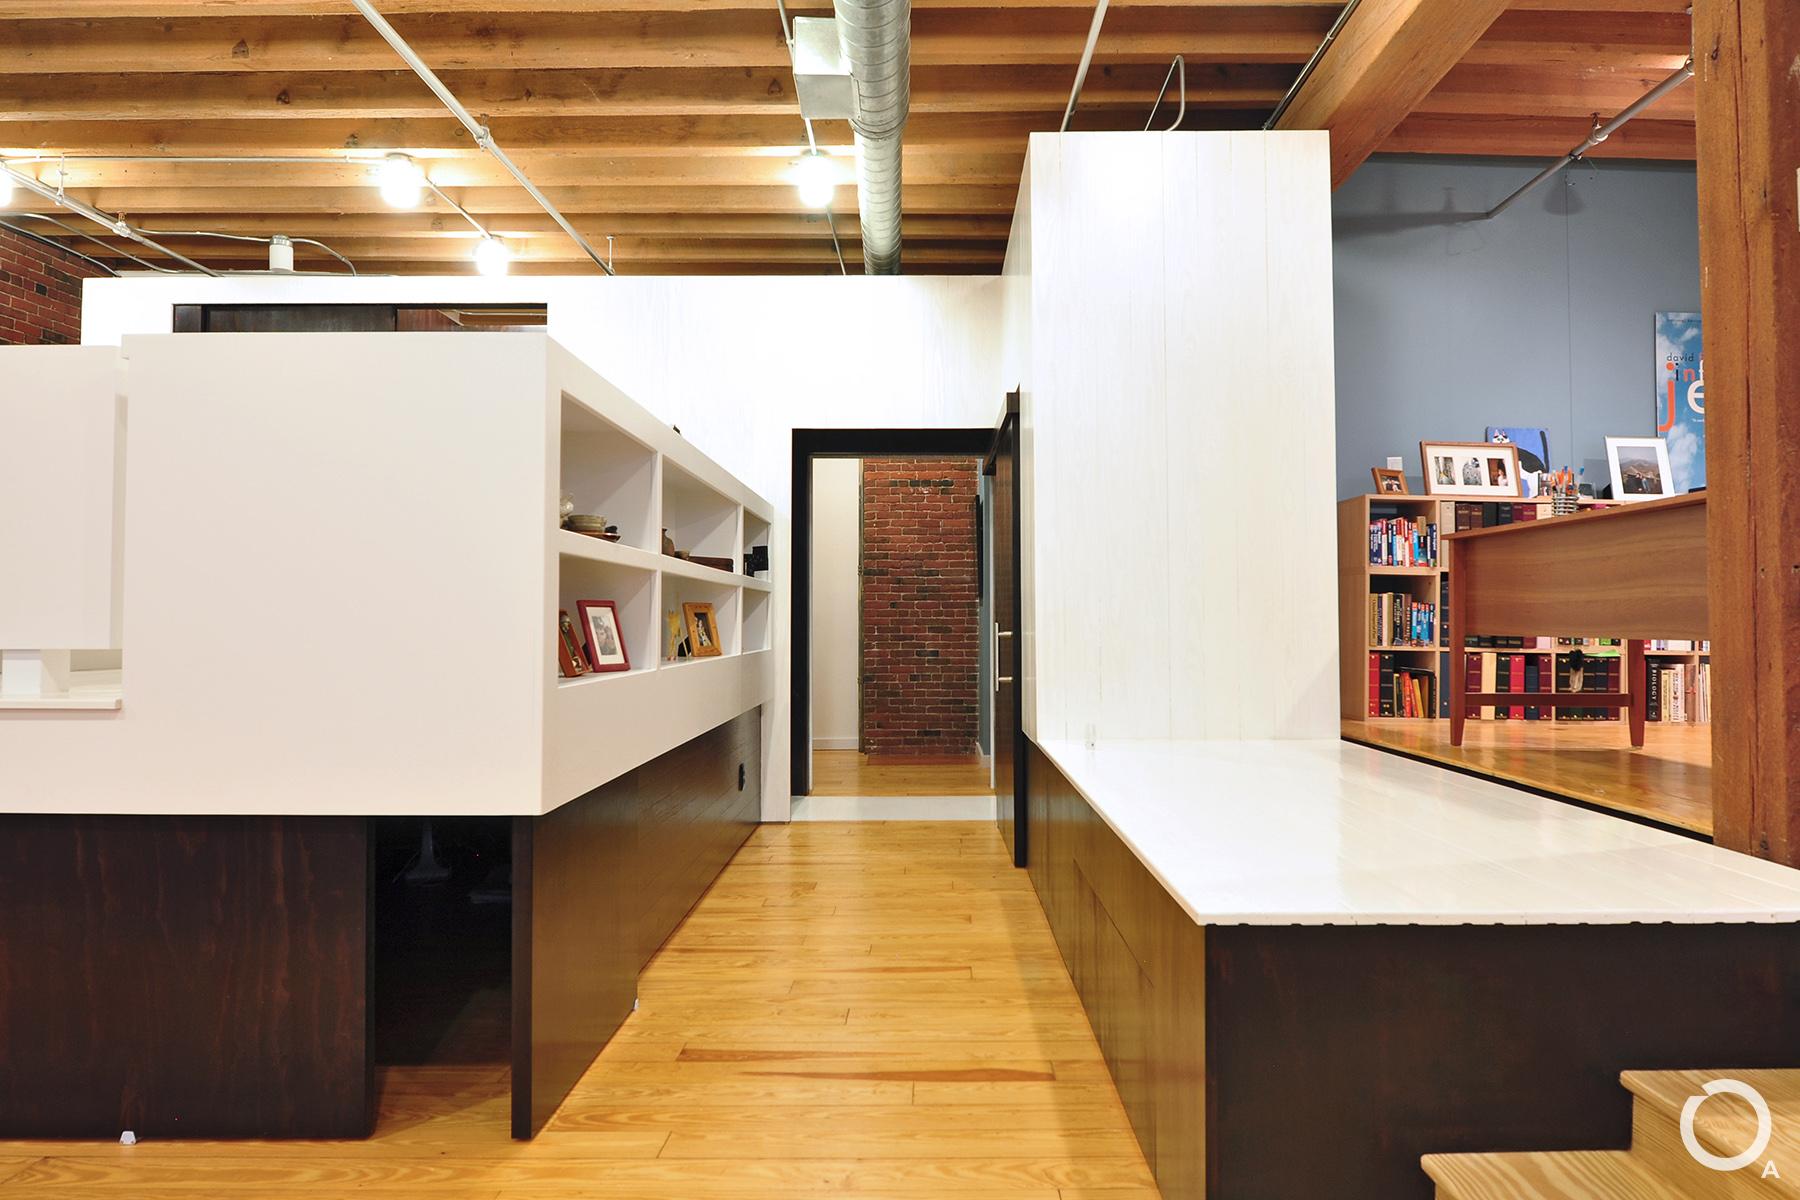 D1 (Leather District Loft Renovation Boston Architect Interior Designer).jpg